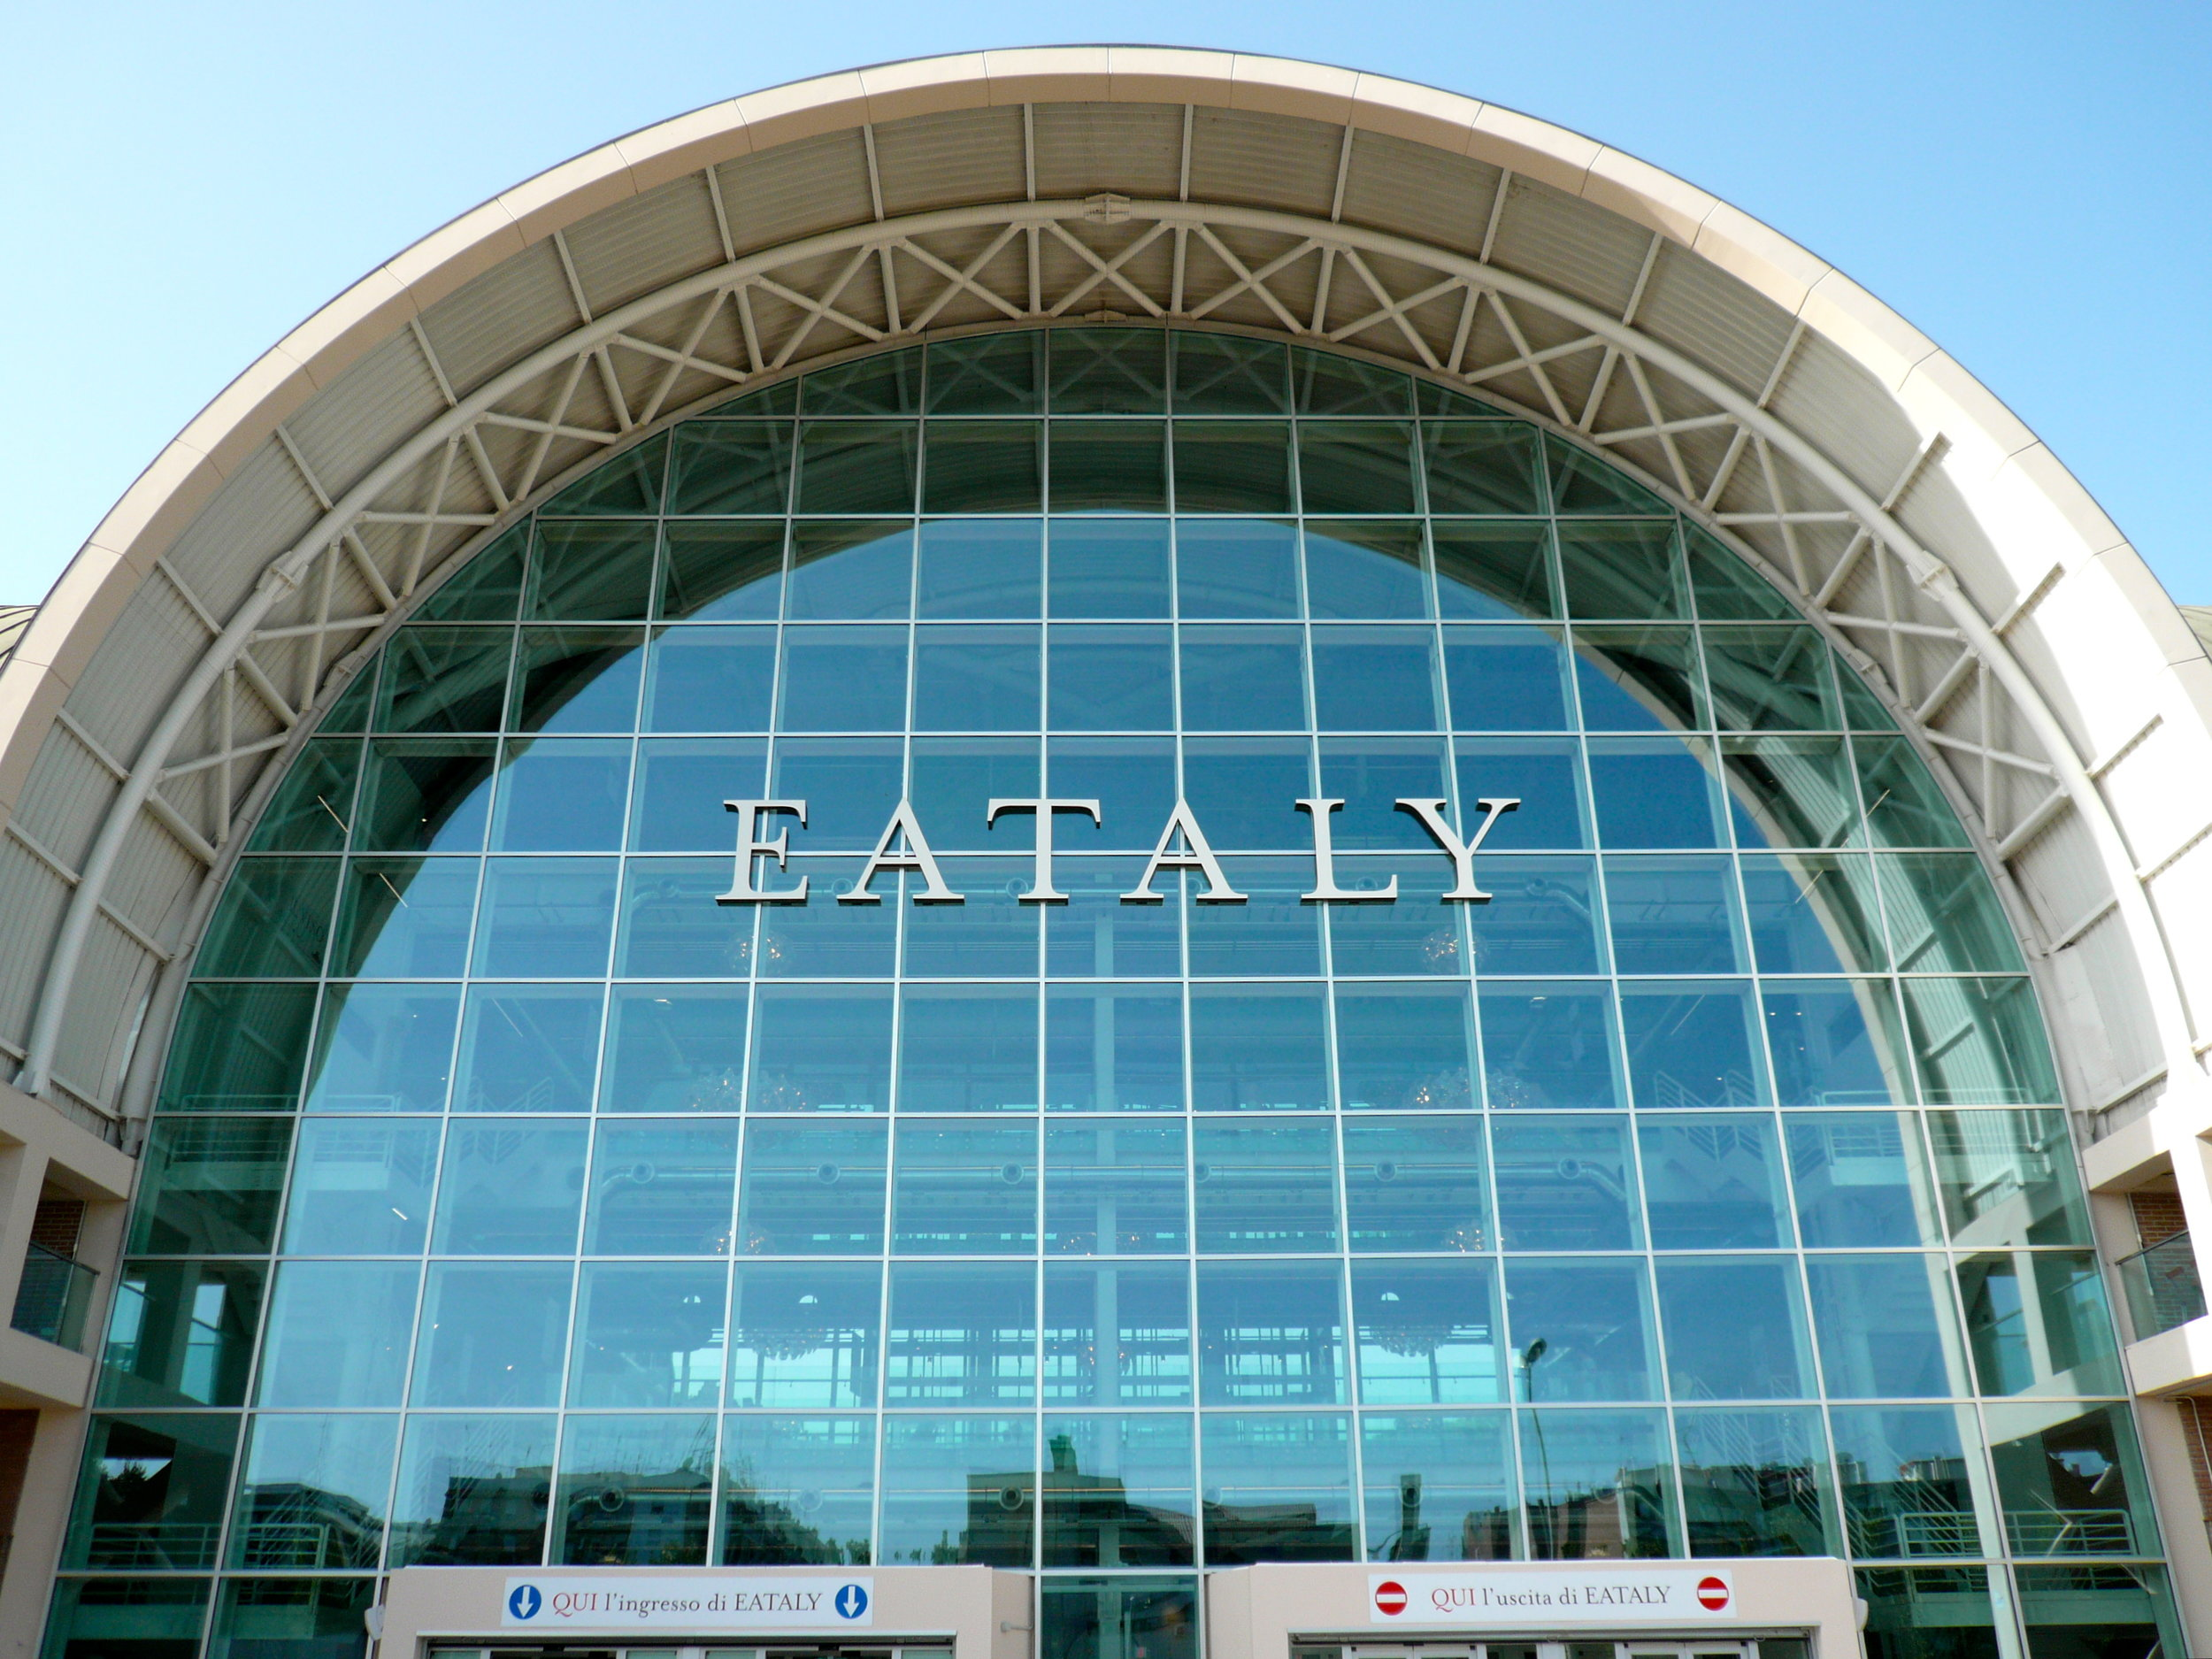 Eataly Rome. tastetrailsrome.com Cooking holidays